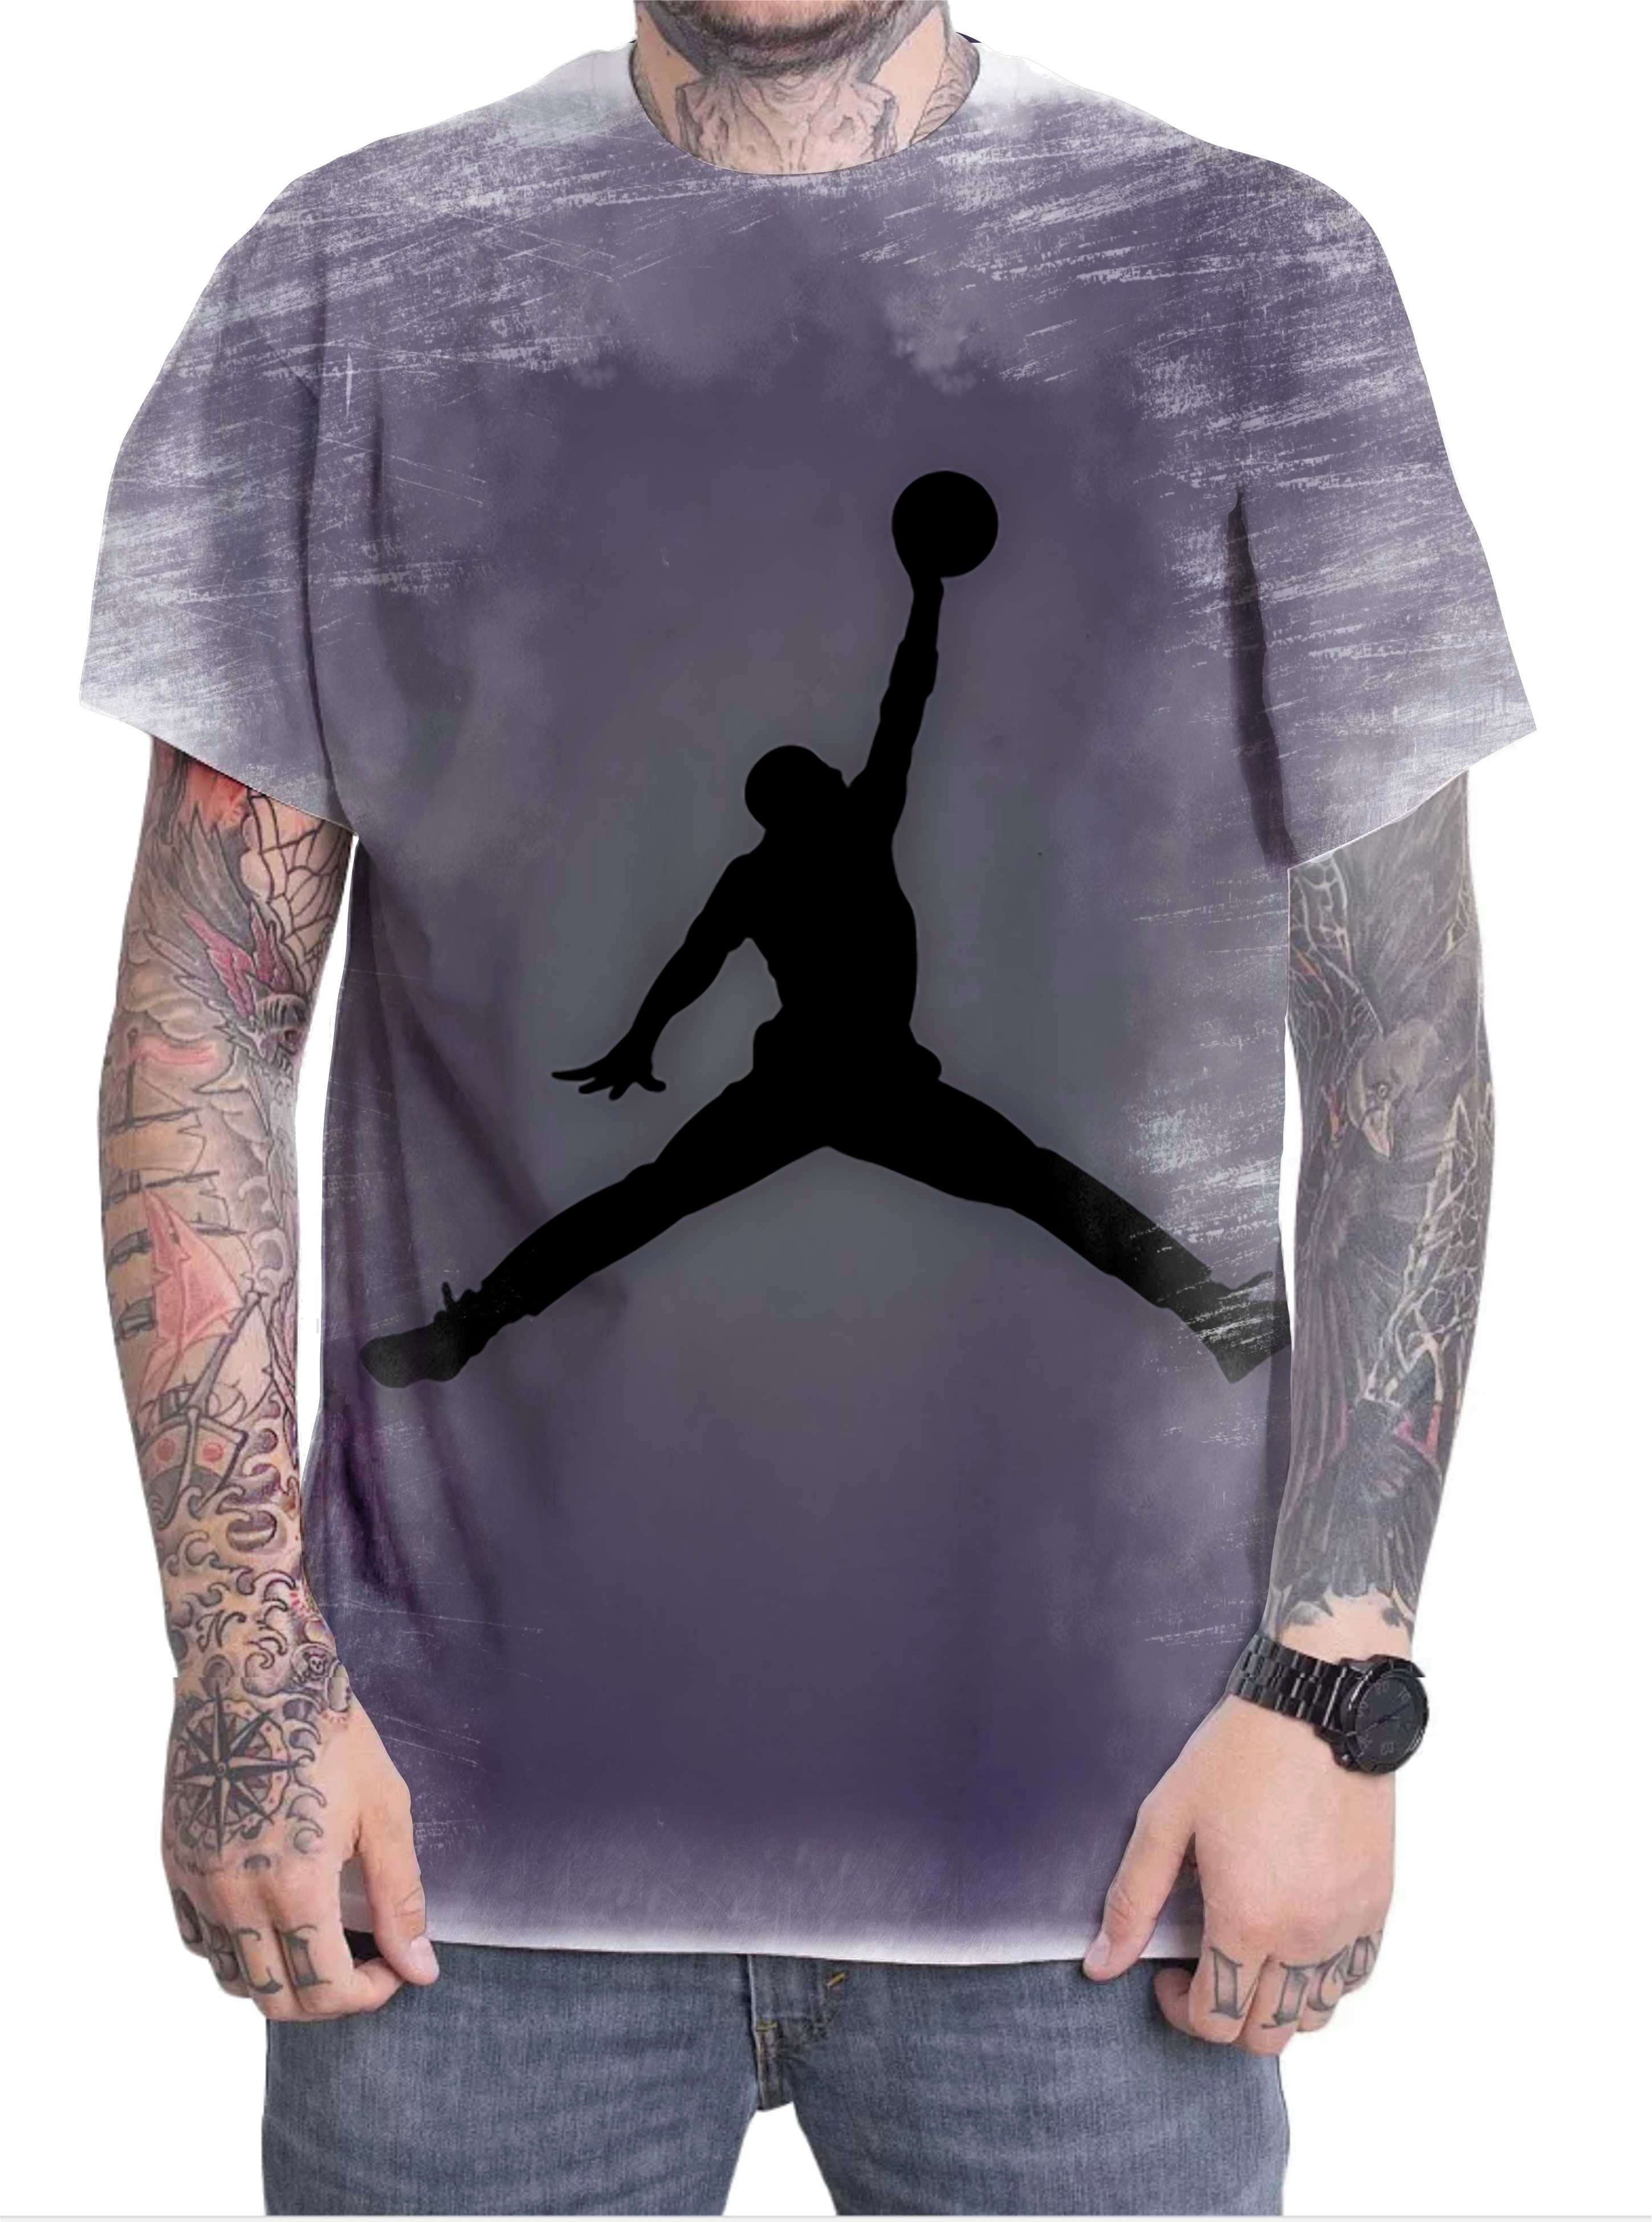 bc8dacf021e Camiseta Preta Jordan Basqueta Nba